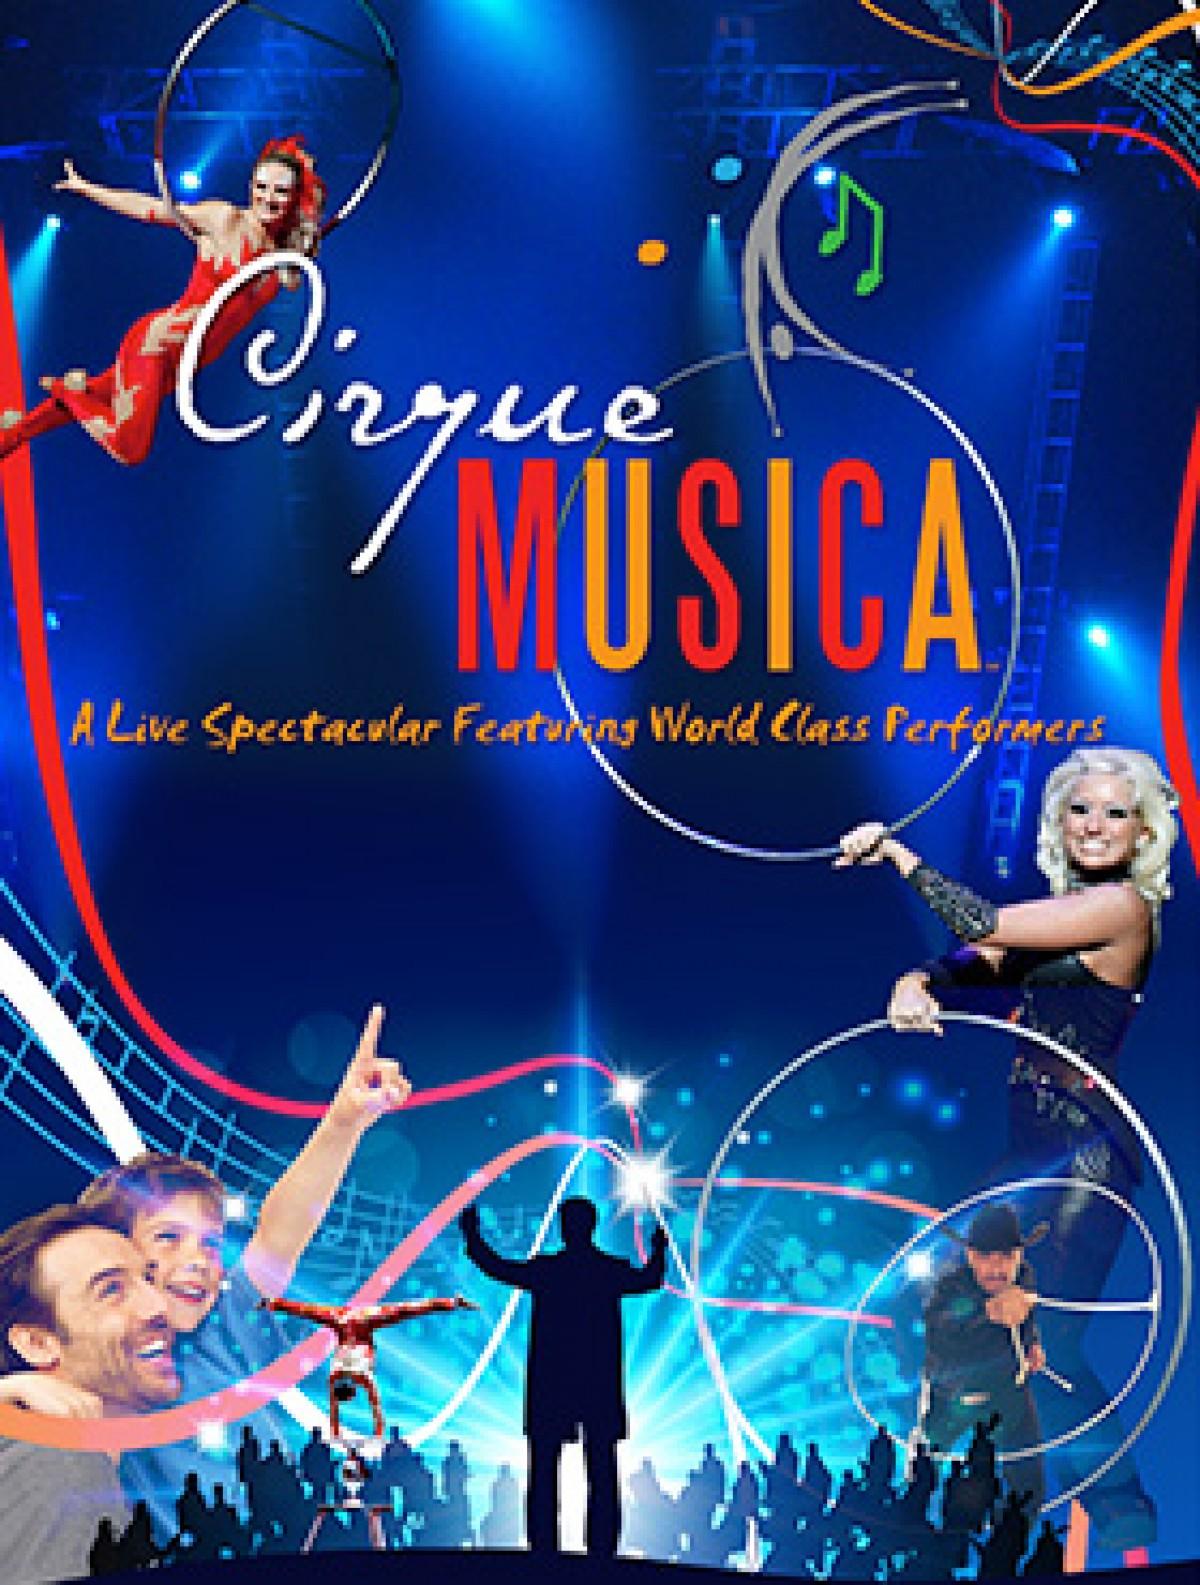 show_cirque-musica.jpg